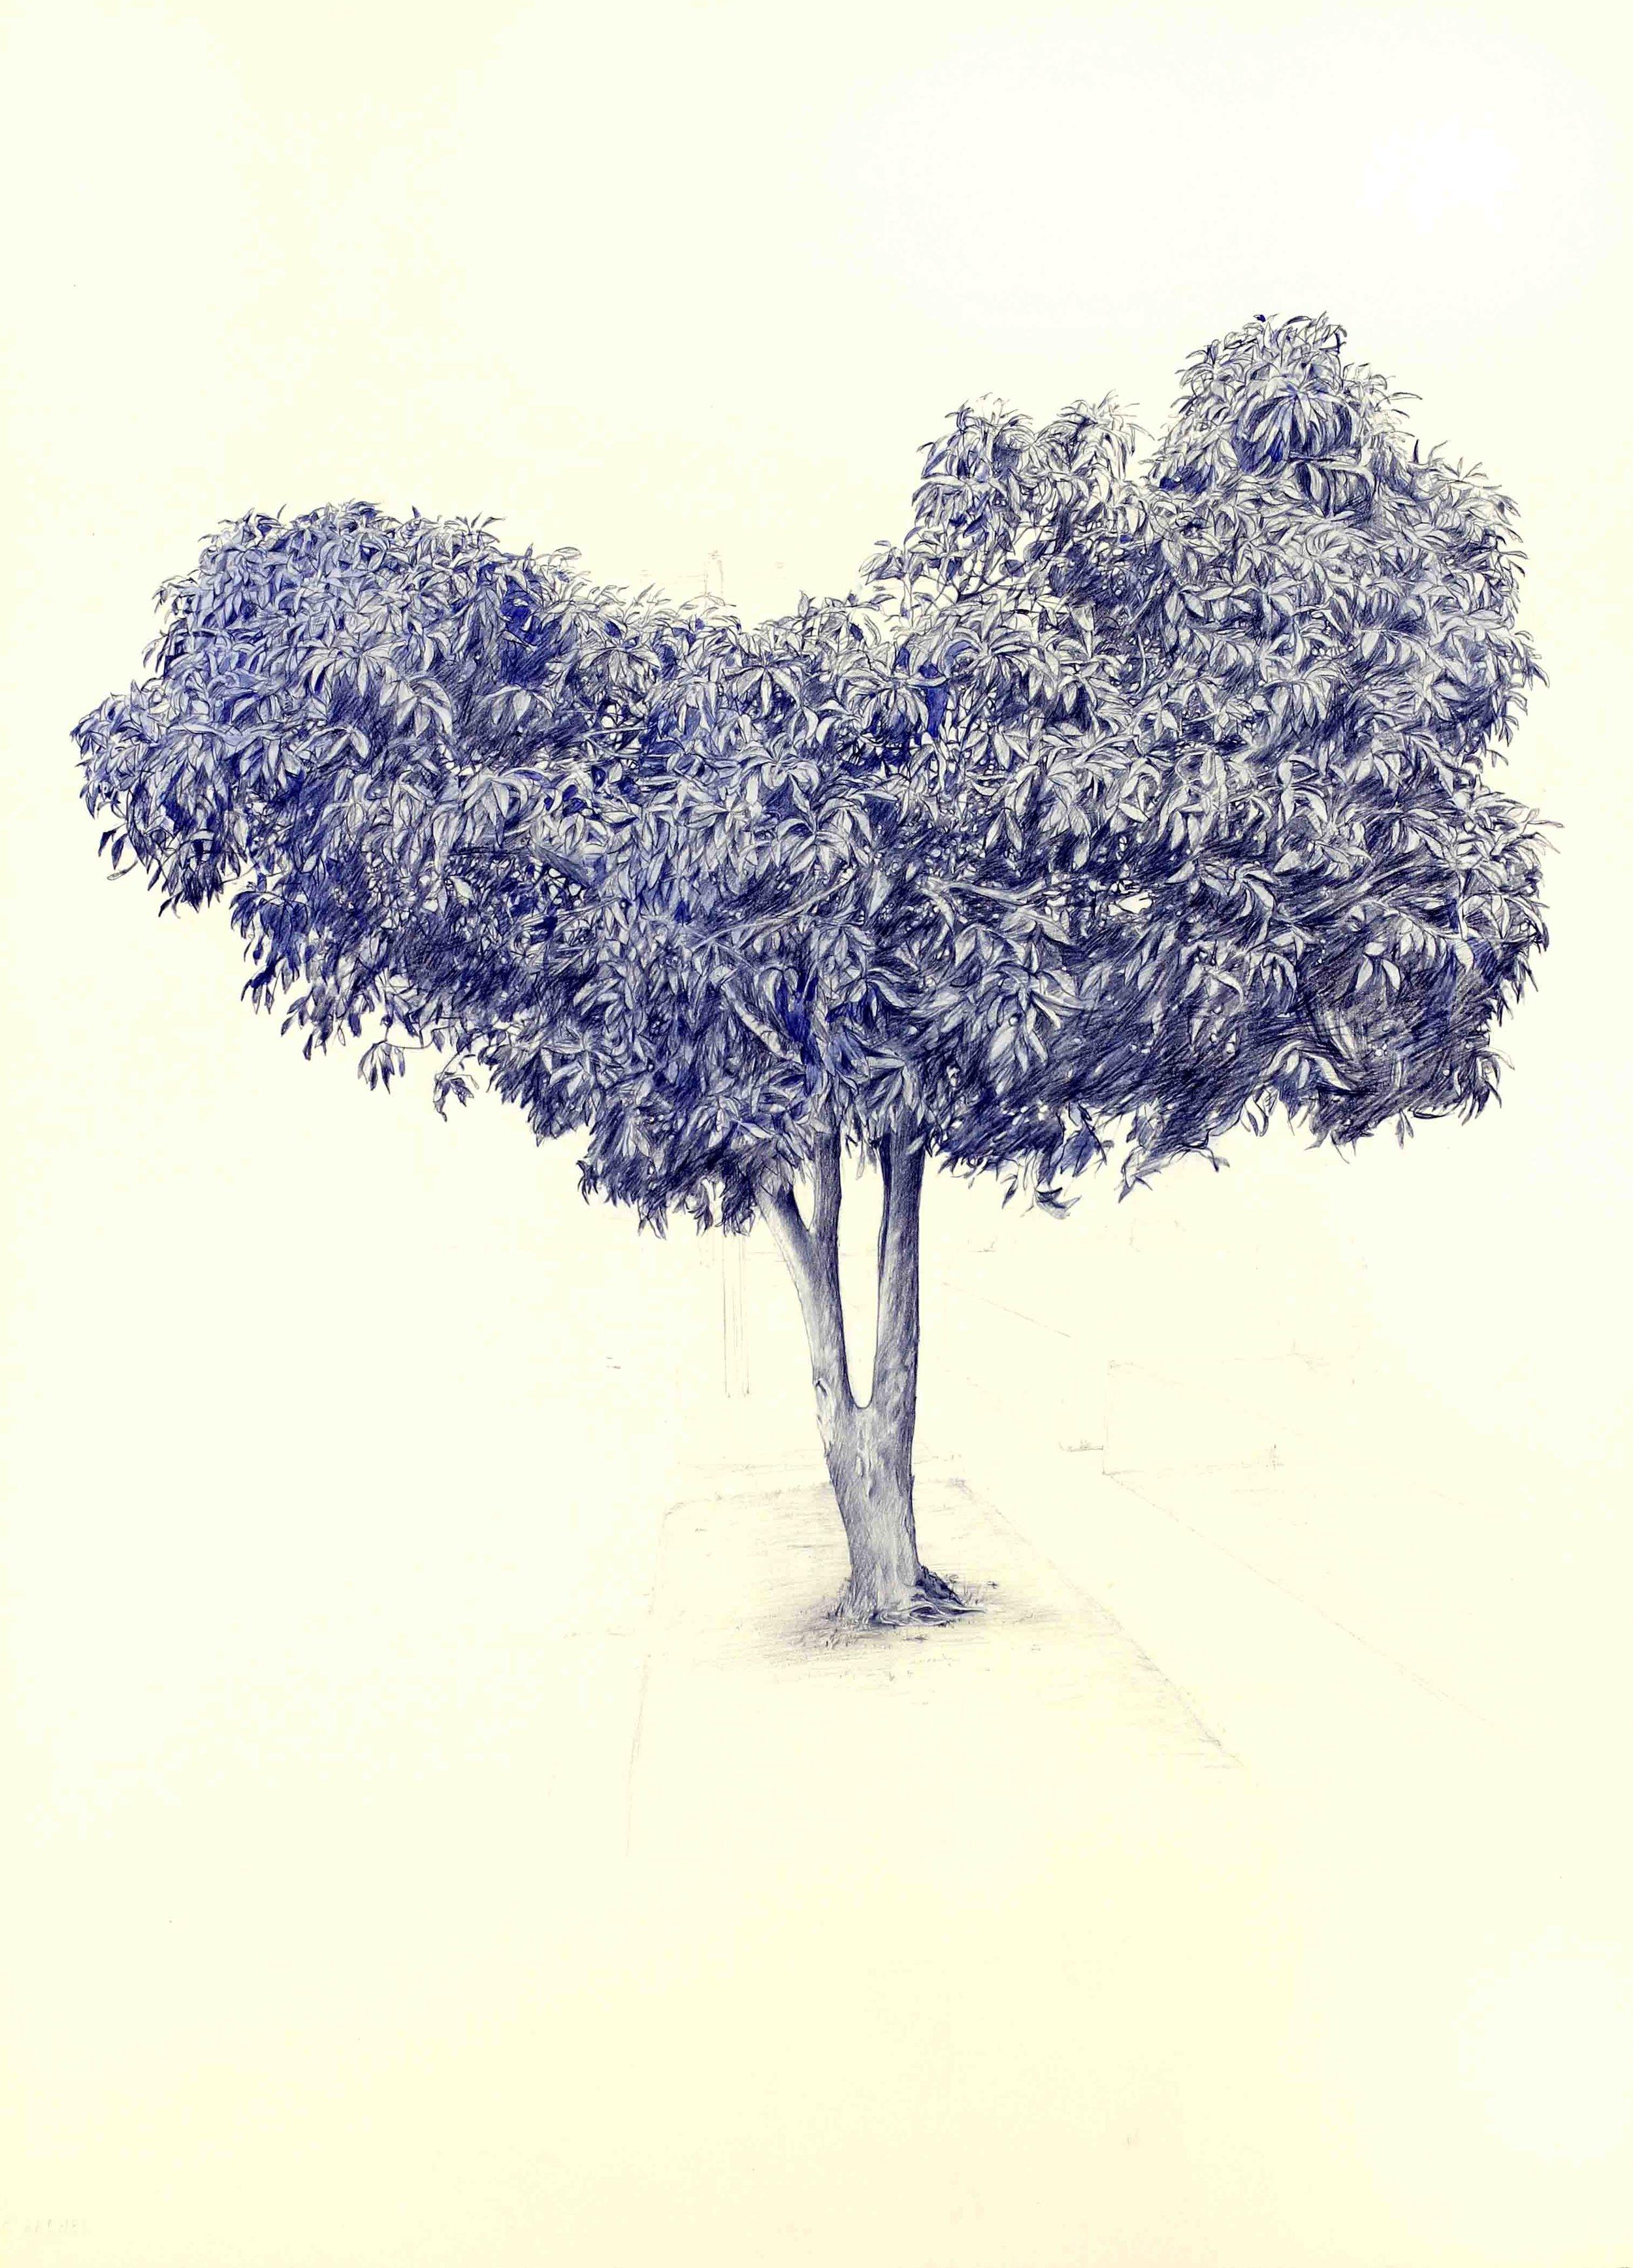 Vin Ryan,  Tree, Sunshine,  2012, pencil on paper, 77 x 57cm